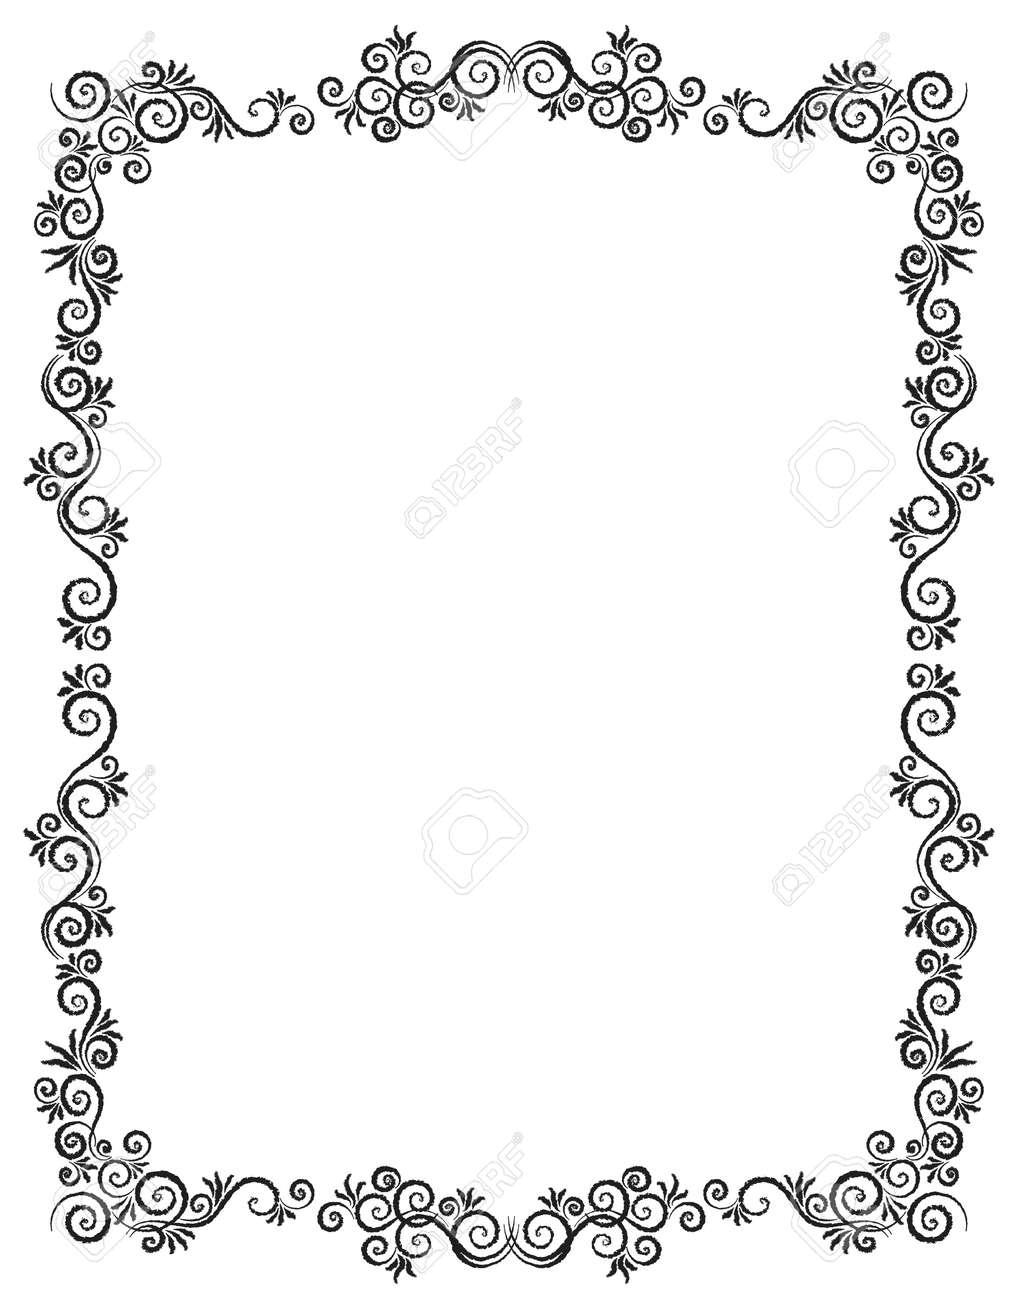 Vintage Ornament Greeting Card Vector Template. Charcoal drawing. Flourishes frame. Vintage Background, Vintage Frame, Vintage Ornament, Ornaments Vector, Ornamental Frame. - 121719702